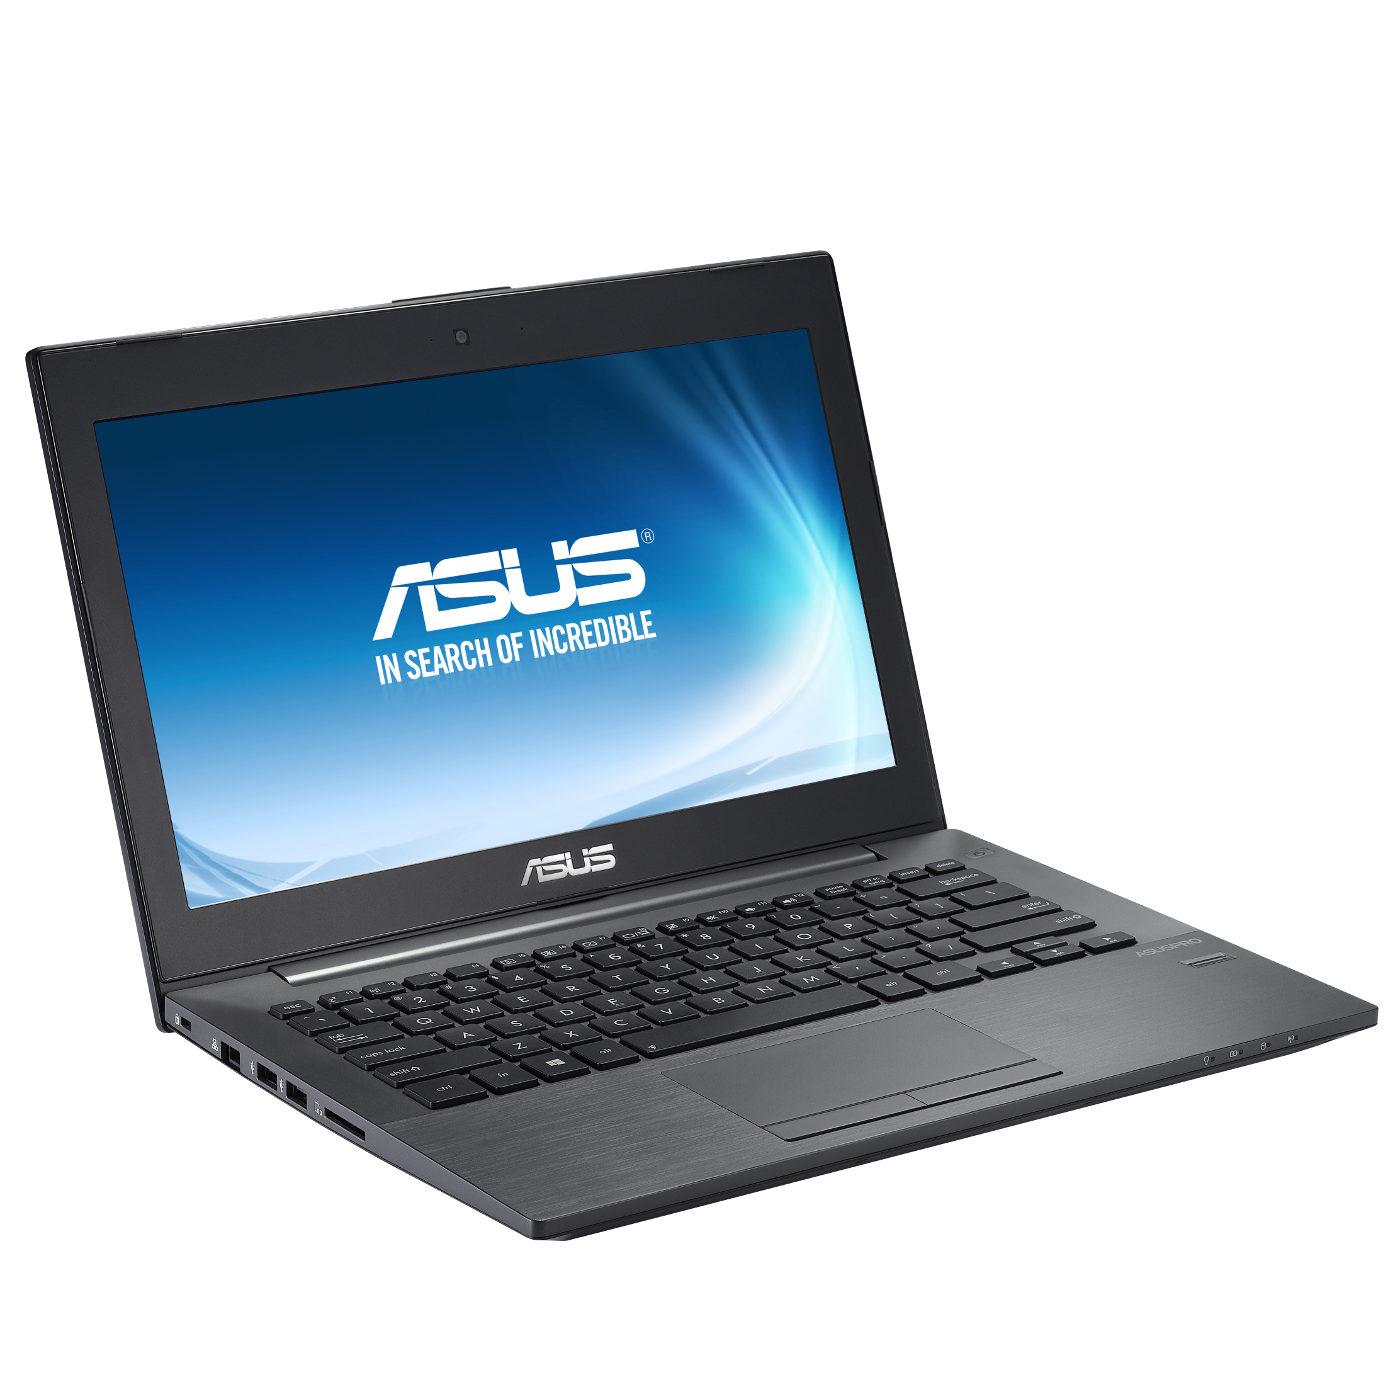 "PC portable ASUS PU301LA-RO122G Intel Core i3-4030U 4 Go 500 Go 13.3"" LED HD Wi-Fi N/Bluetooth Webcam Windows 7 Pro 64 bits + Windows 8 Pro 64 bits (garantie constructeur 2 ans)"